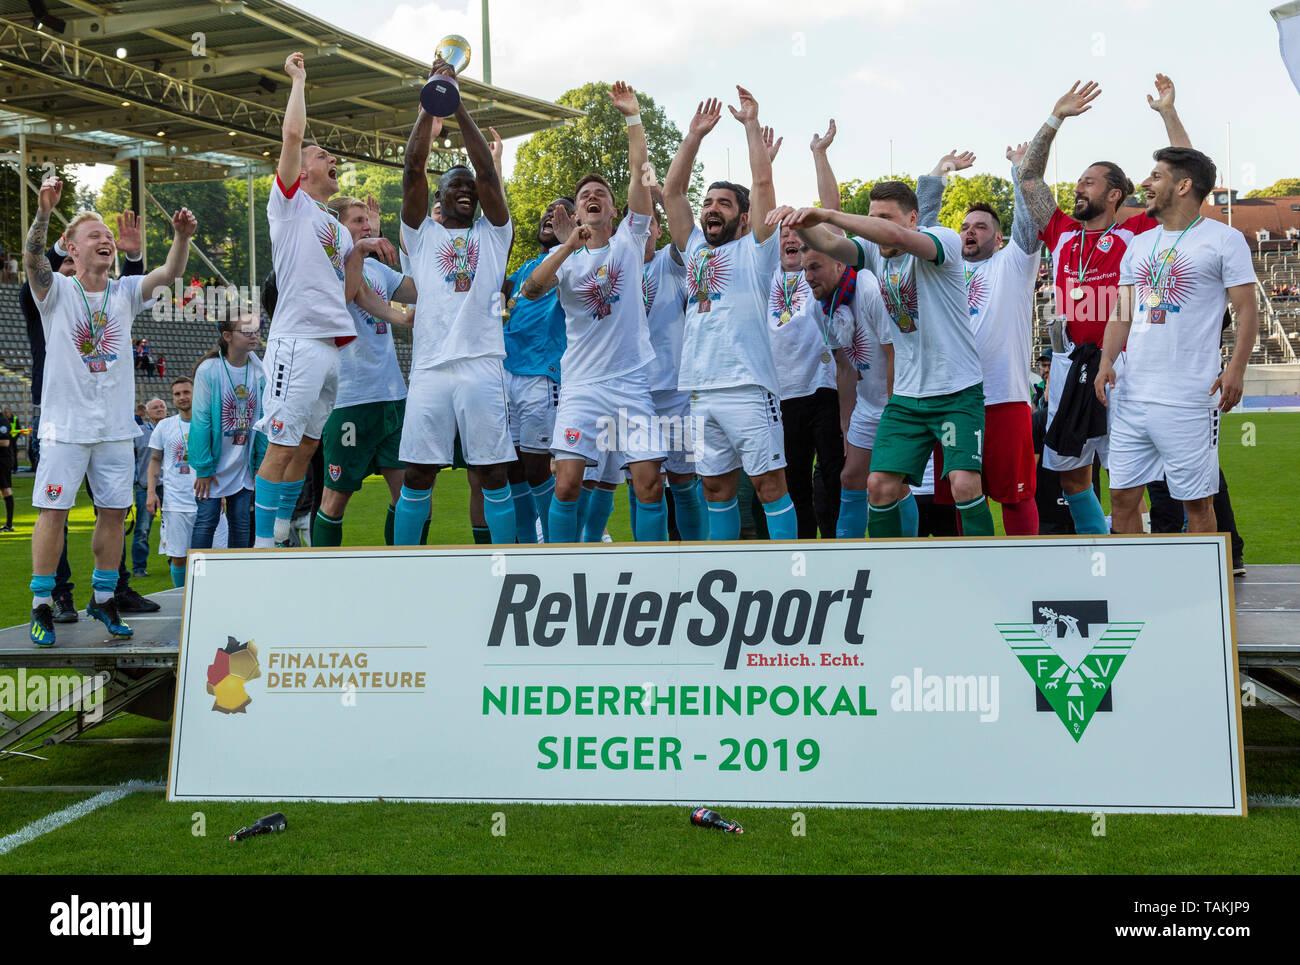 Sport, Fussball, Reviersport Niederrheinpokal, 2018/2019, Finale, Wuppertaler SV vs. KFC Uerdingen 1-2, Stadion Am Zoo in Wuppertal, Jubel nach dem Pokalsieg, Uerdinger Mannschaft mit dem Pokal, sports, football, Lower Rhine Cup, 2018/2019, final, Wuppertaler SV vs. KFC Uerdingen 1-2, Stadium Am Zoo in Wuppertal, rejoicing at the cup victory, Uerdingen team presenting the cup *** Local Caption *** sports, football, Lower Rhine Cup, 2018/2019, final, Wuppertaler SV vs. KFC Uerdingen 1-2, Stadium Am Zoo in Wuppertal, rejoicing at the cup victory, Uerdingen team presenting the cup - Stock Image